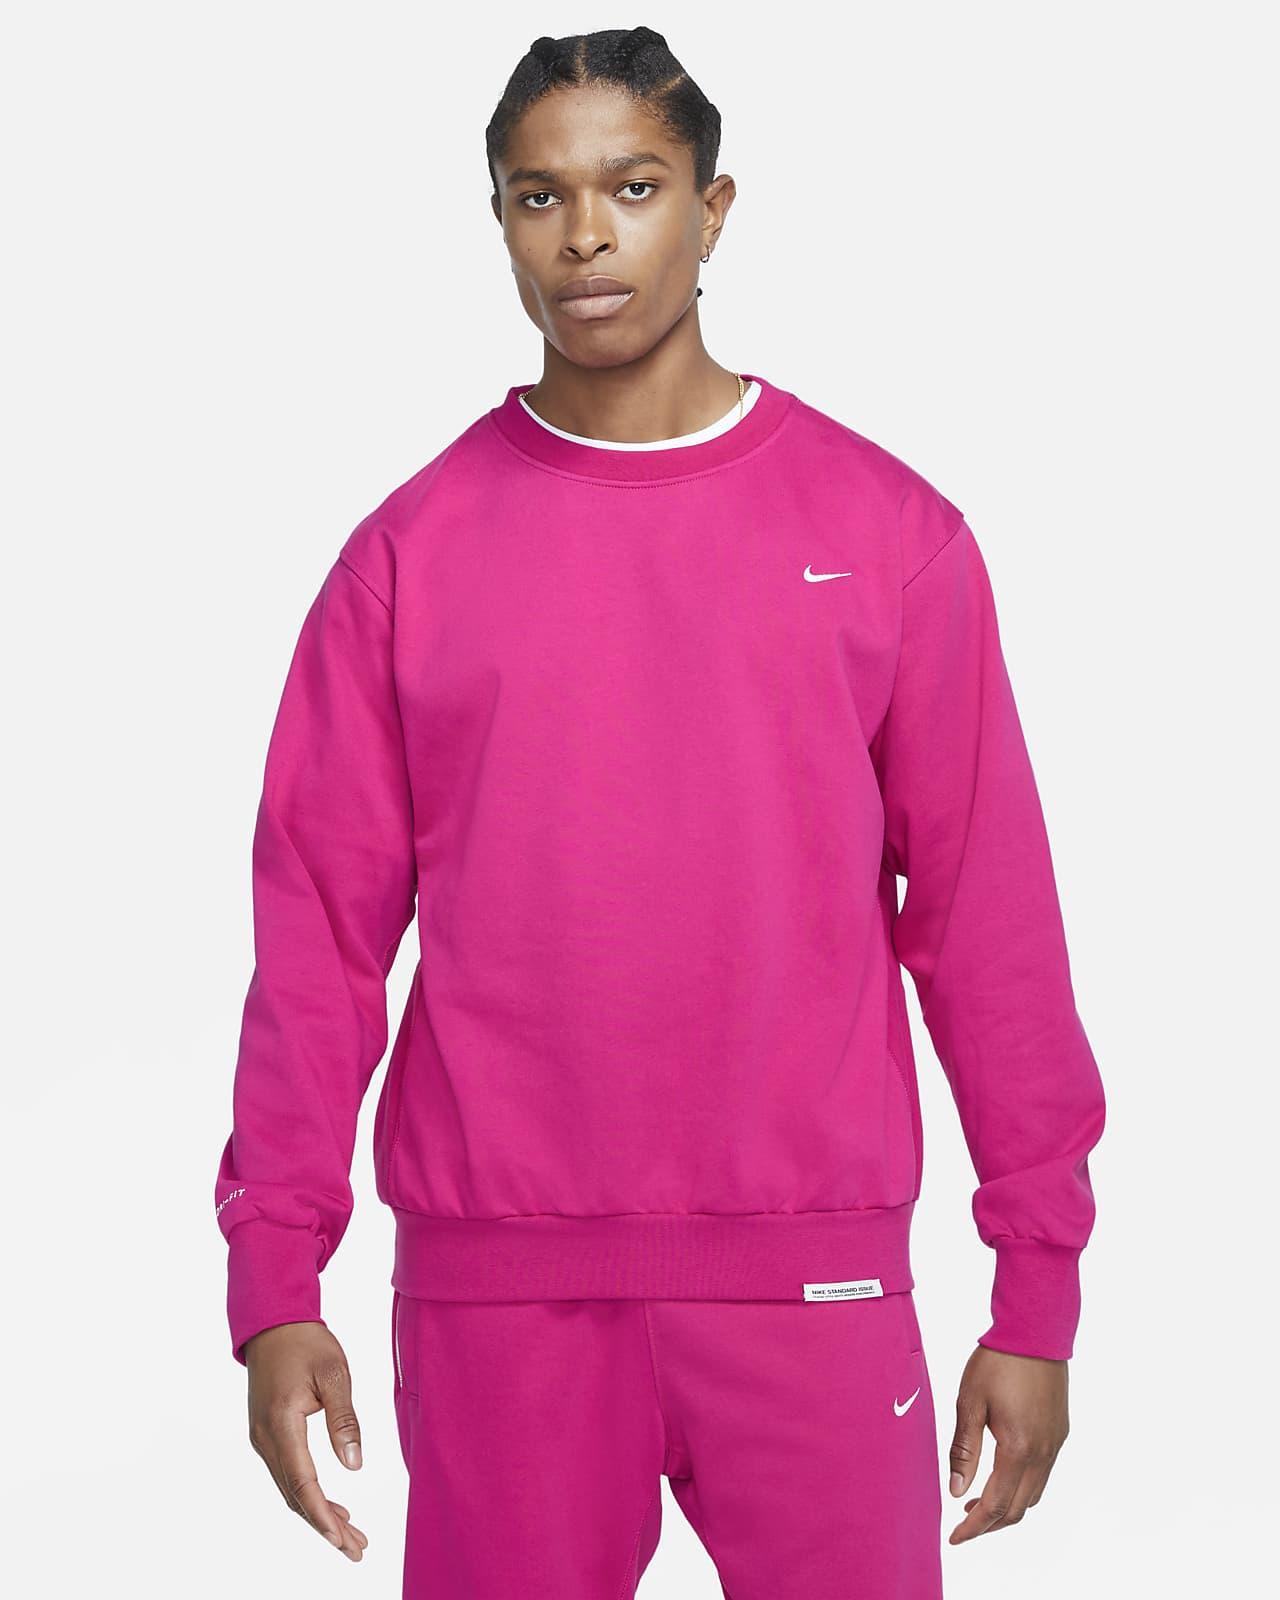 Sudadera de básquetbol para hombre Nike Standard Issue